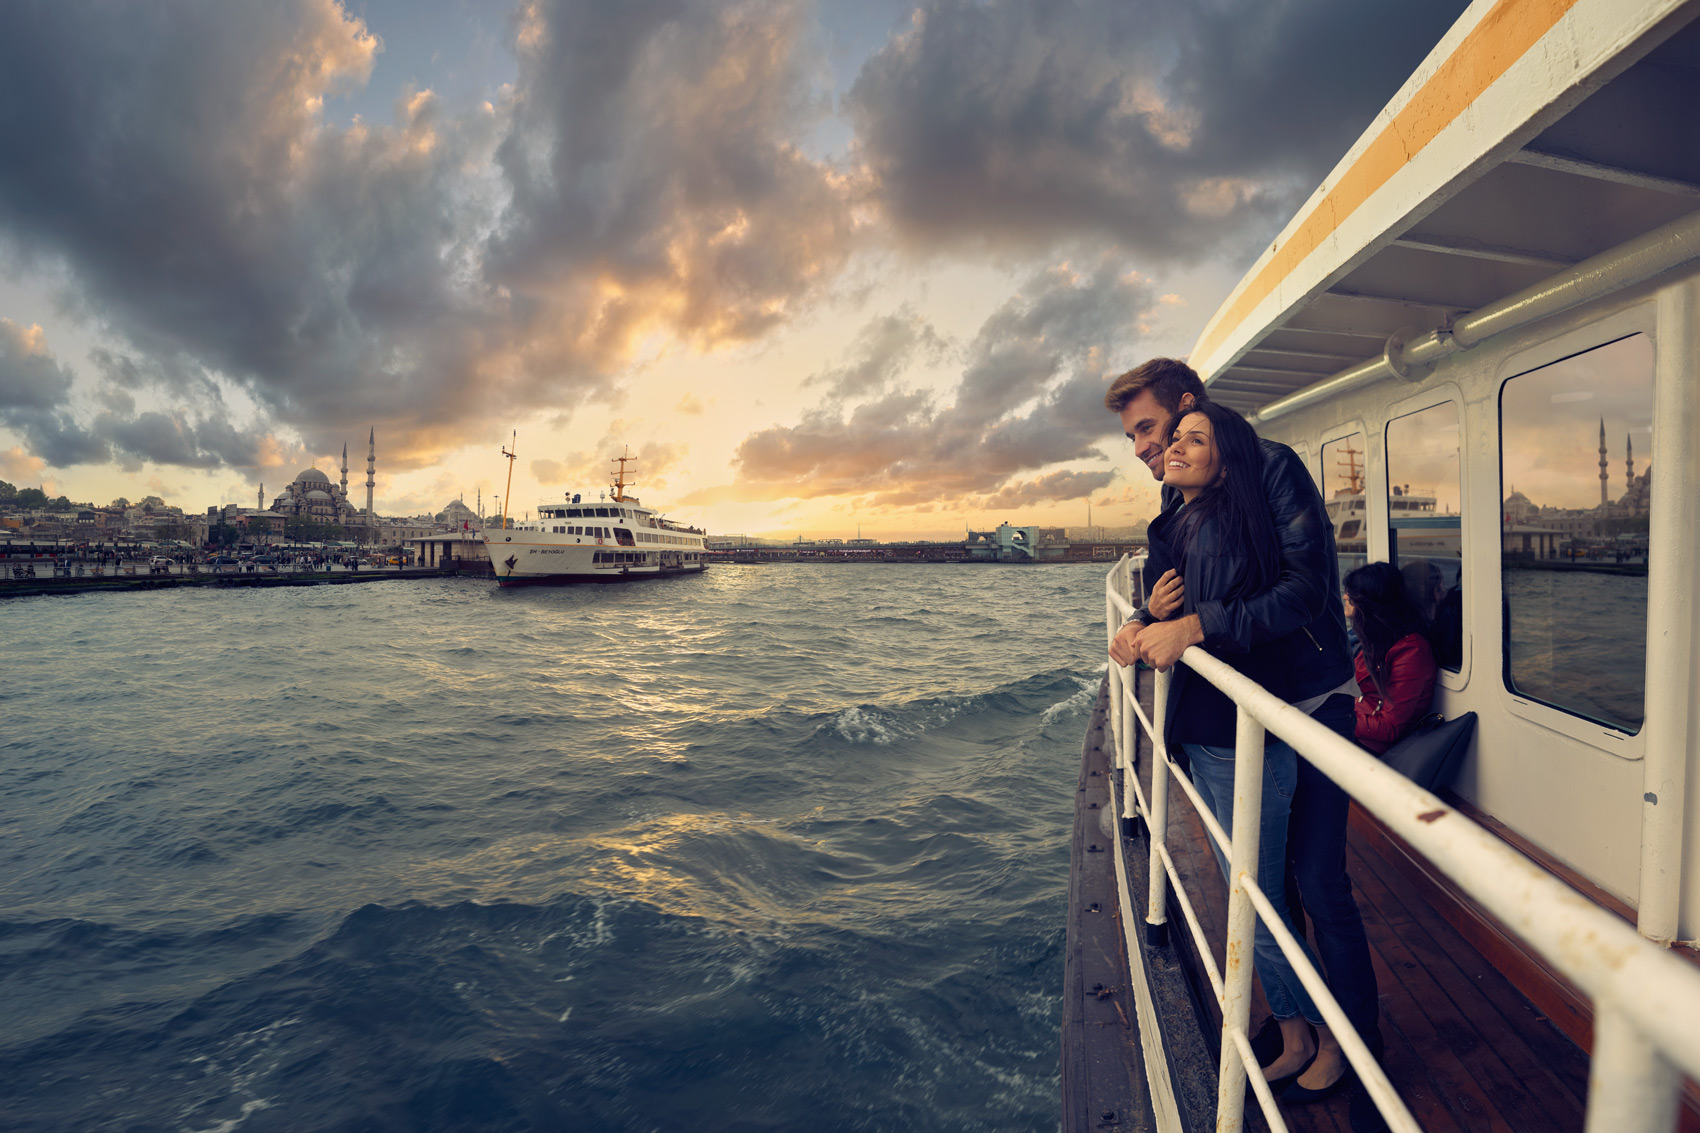 EuroTravel_istanbul_Ferry_v2b.jpg